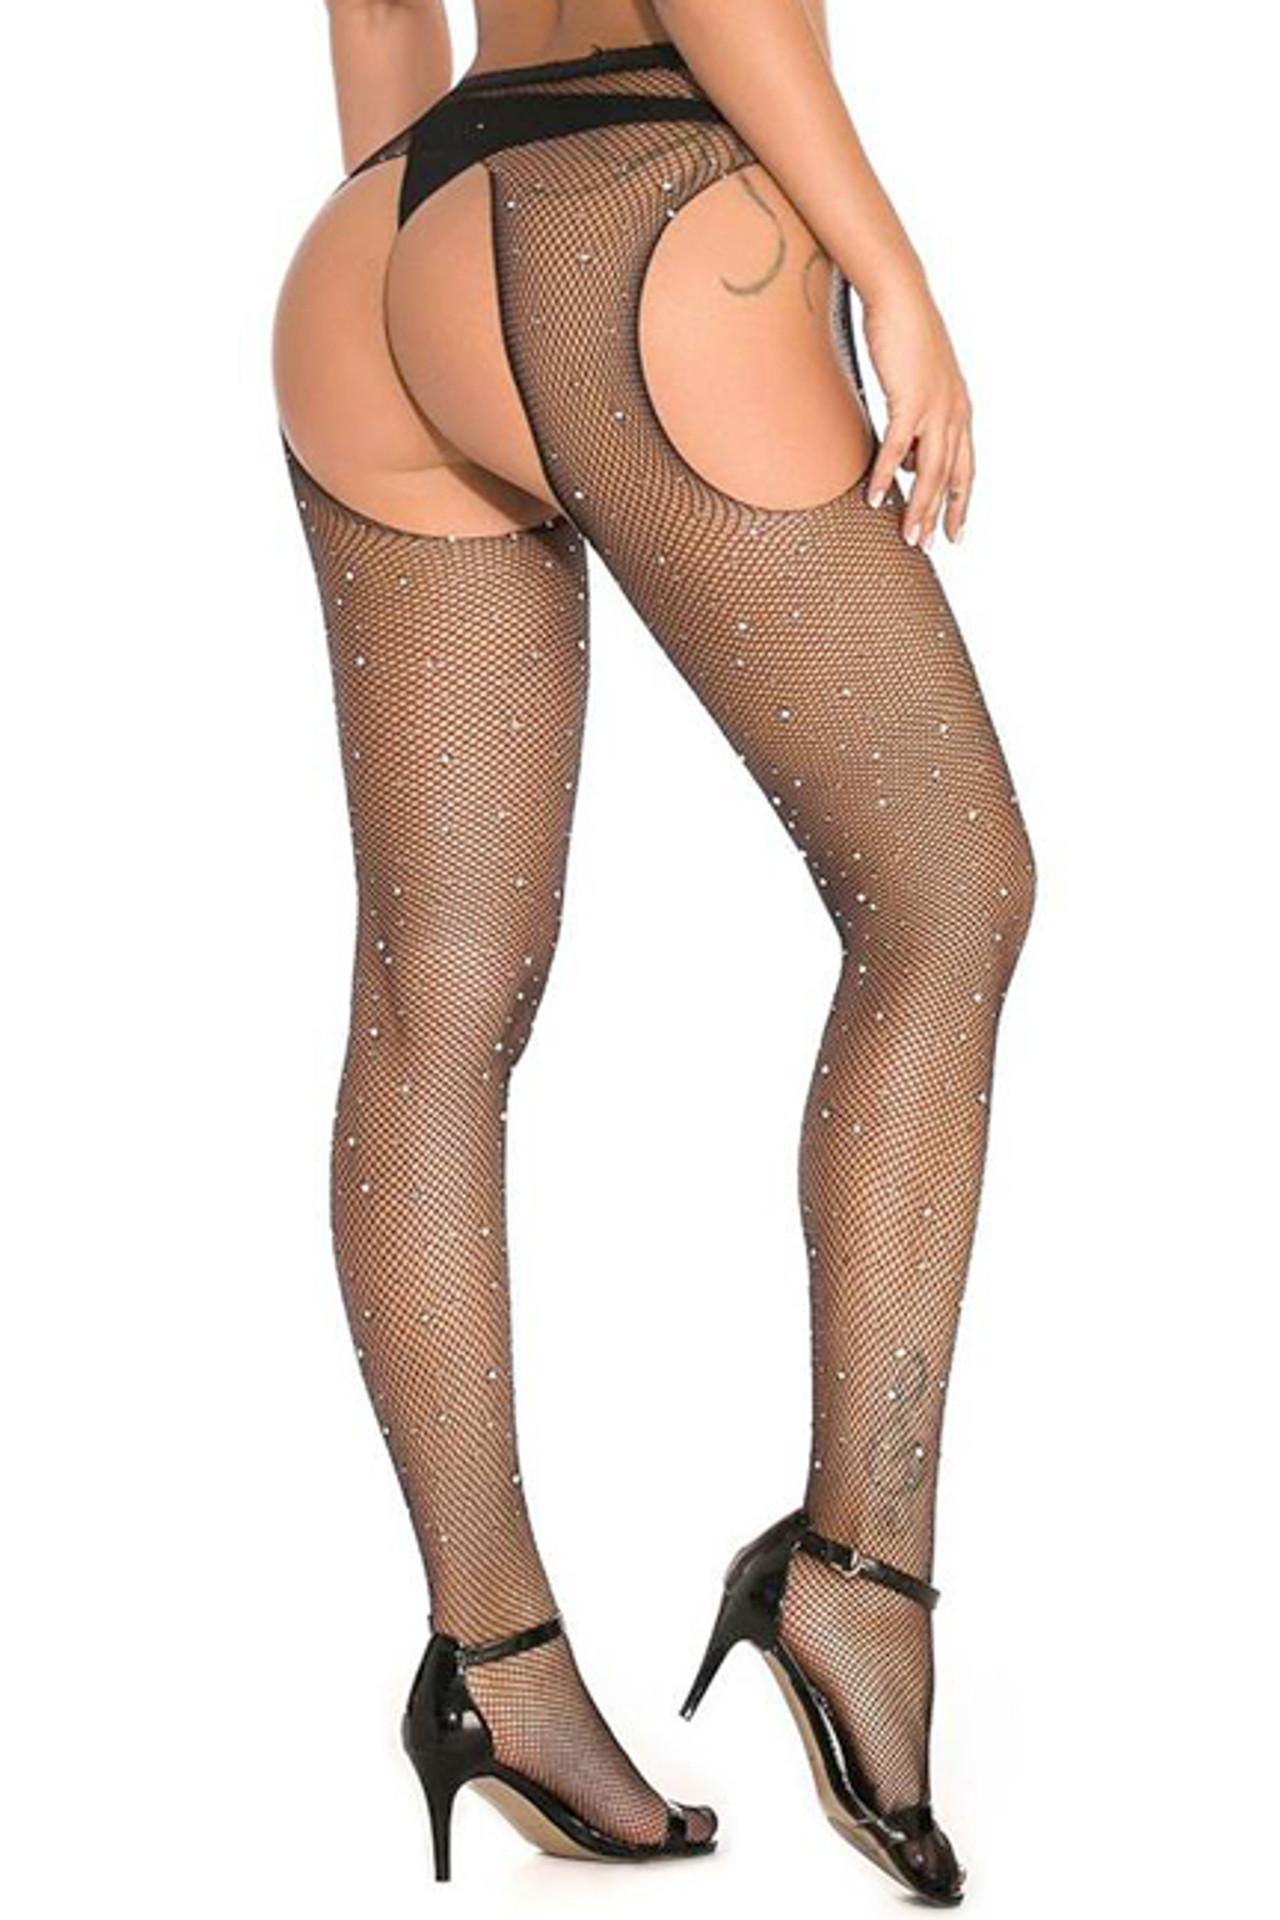 Black Sparkle Fishnet Rhinestone Garter Pantyhose